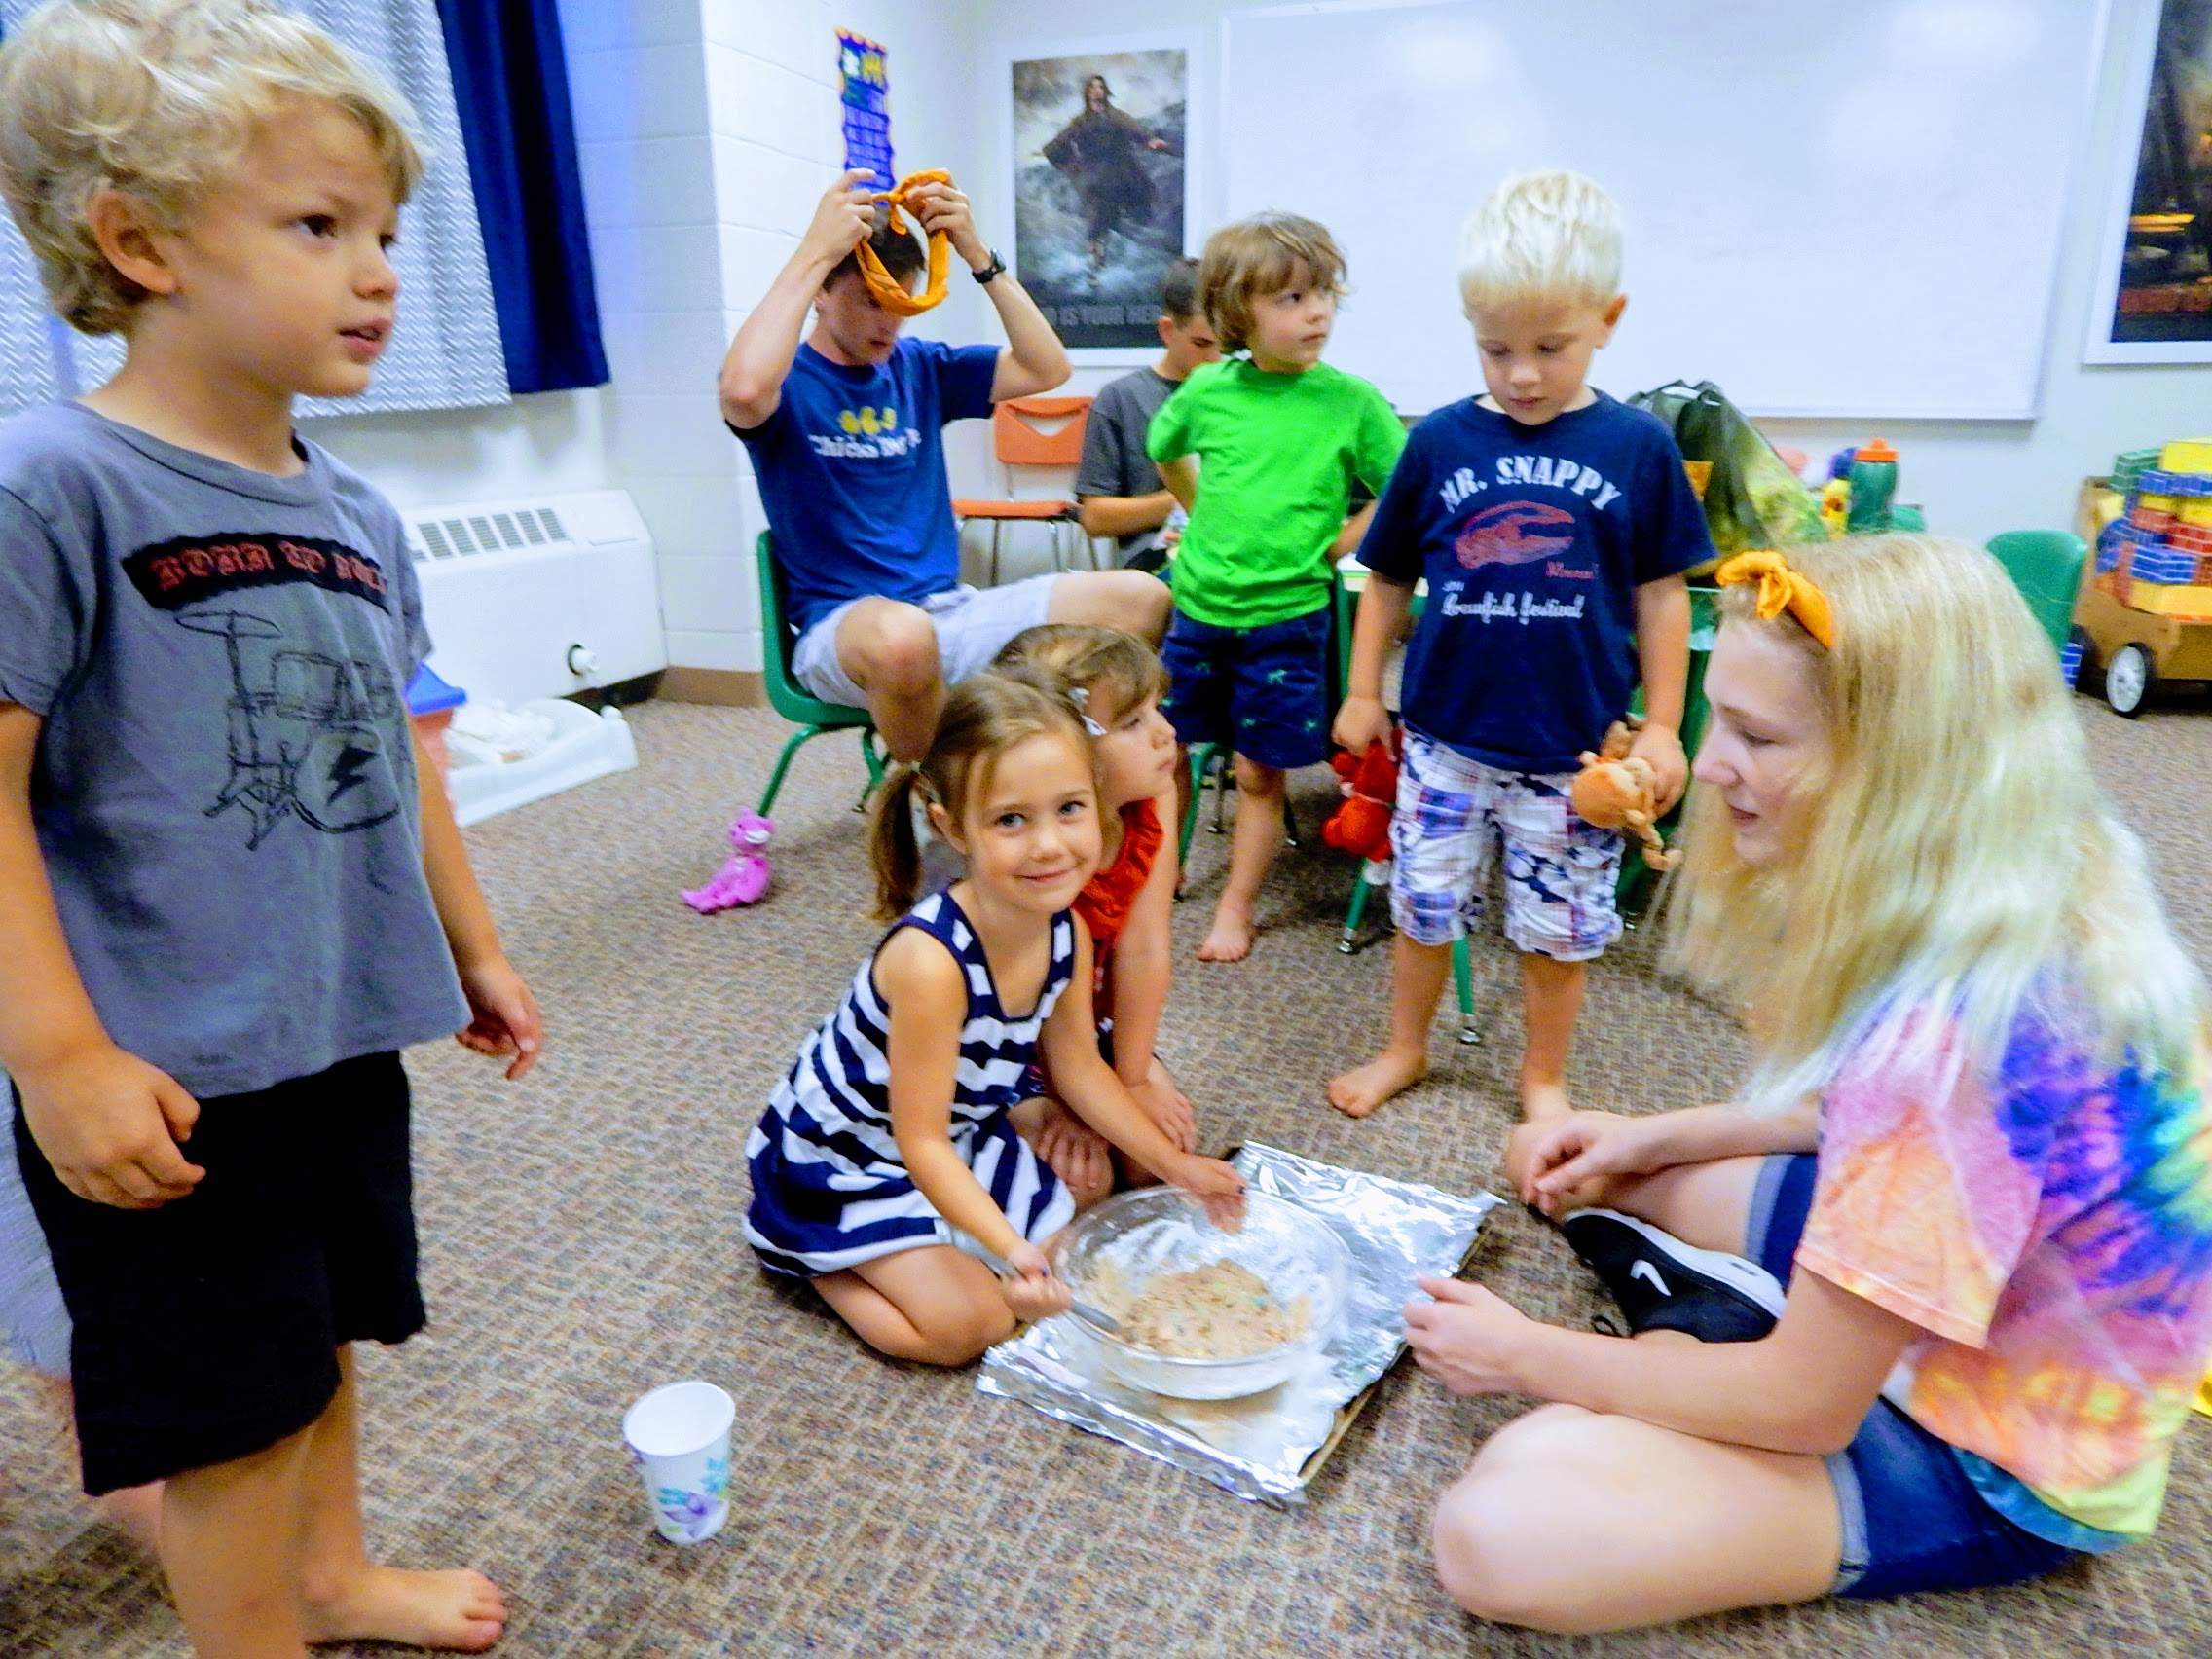 Preschool Three Four Year Olds First Congregational Church Of